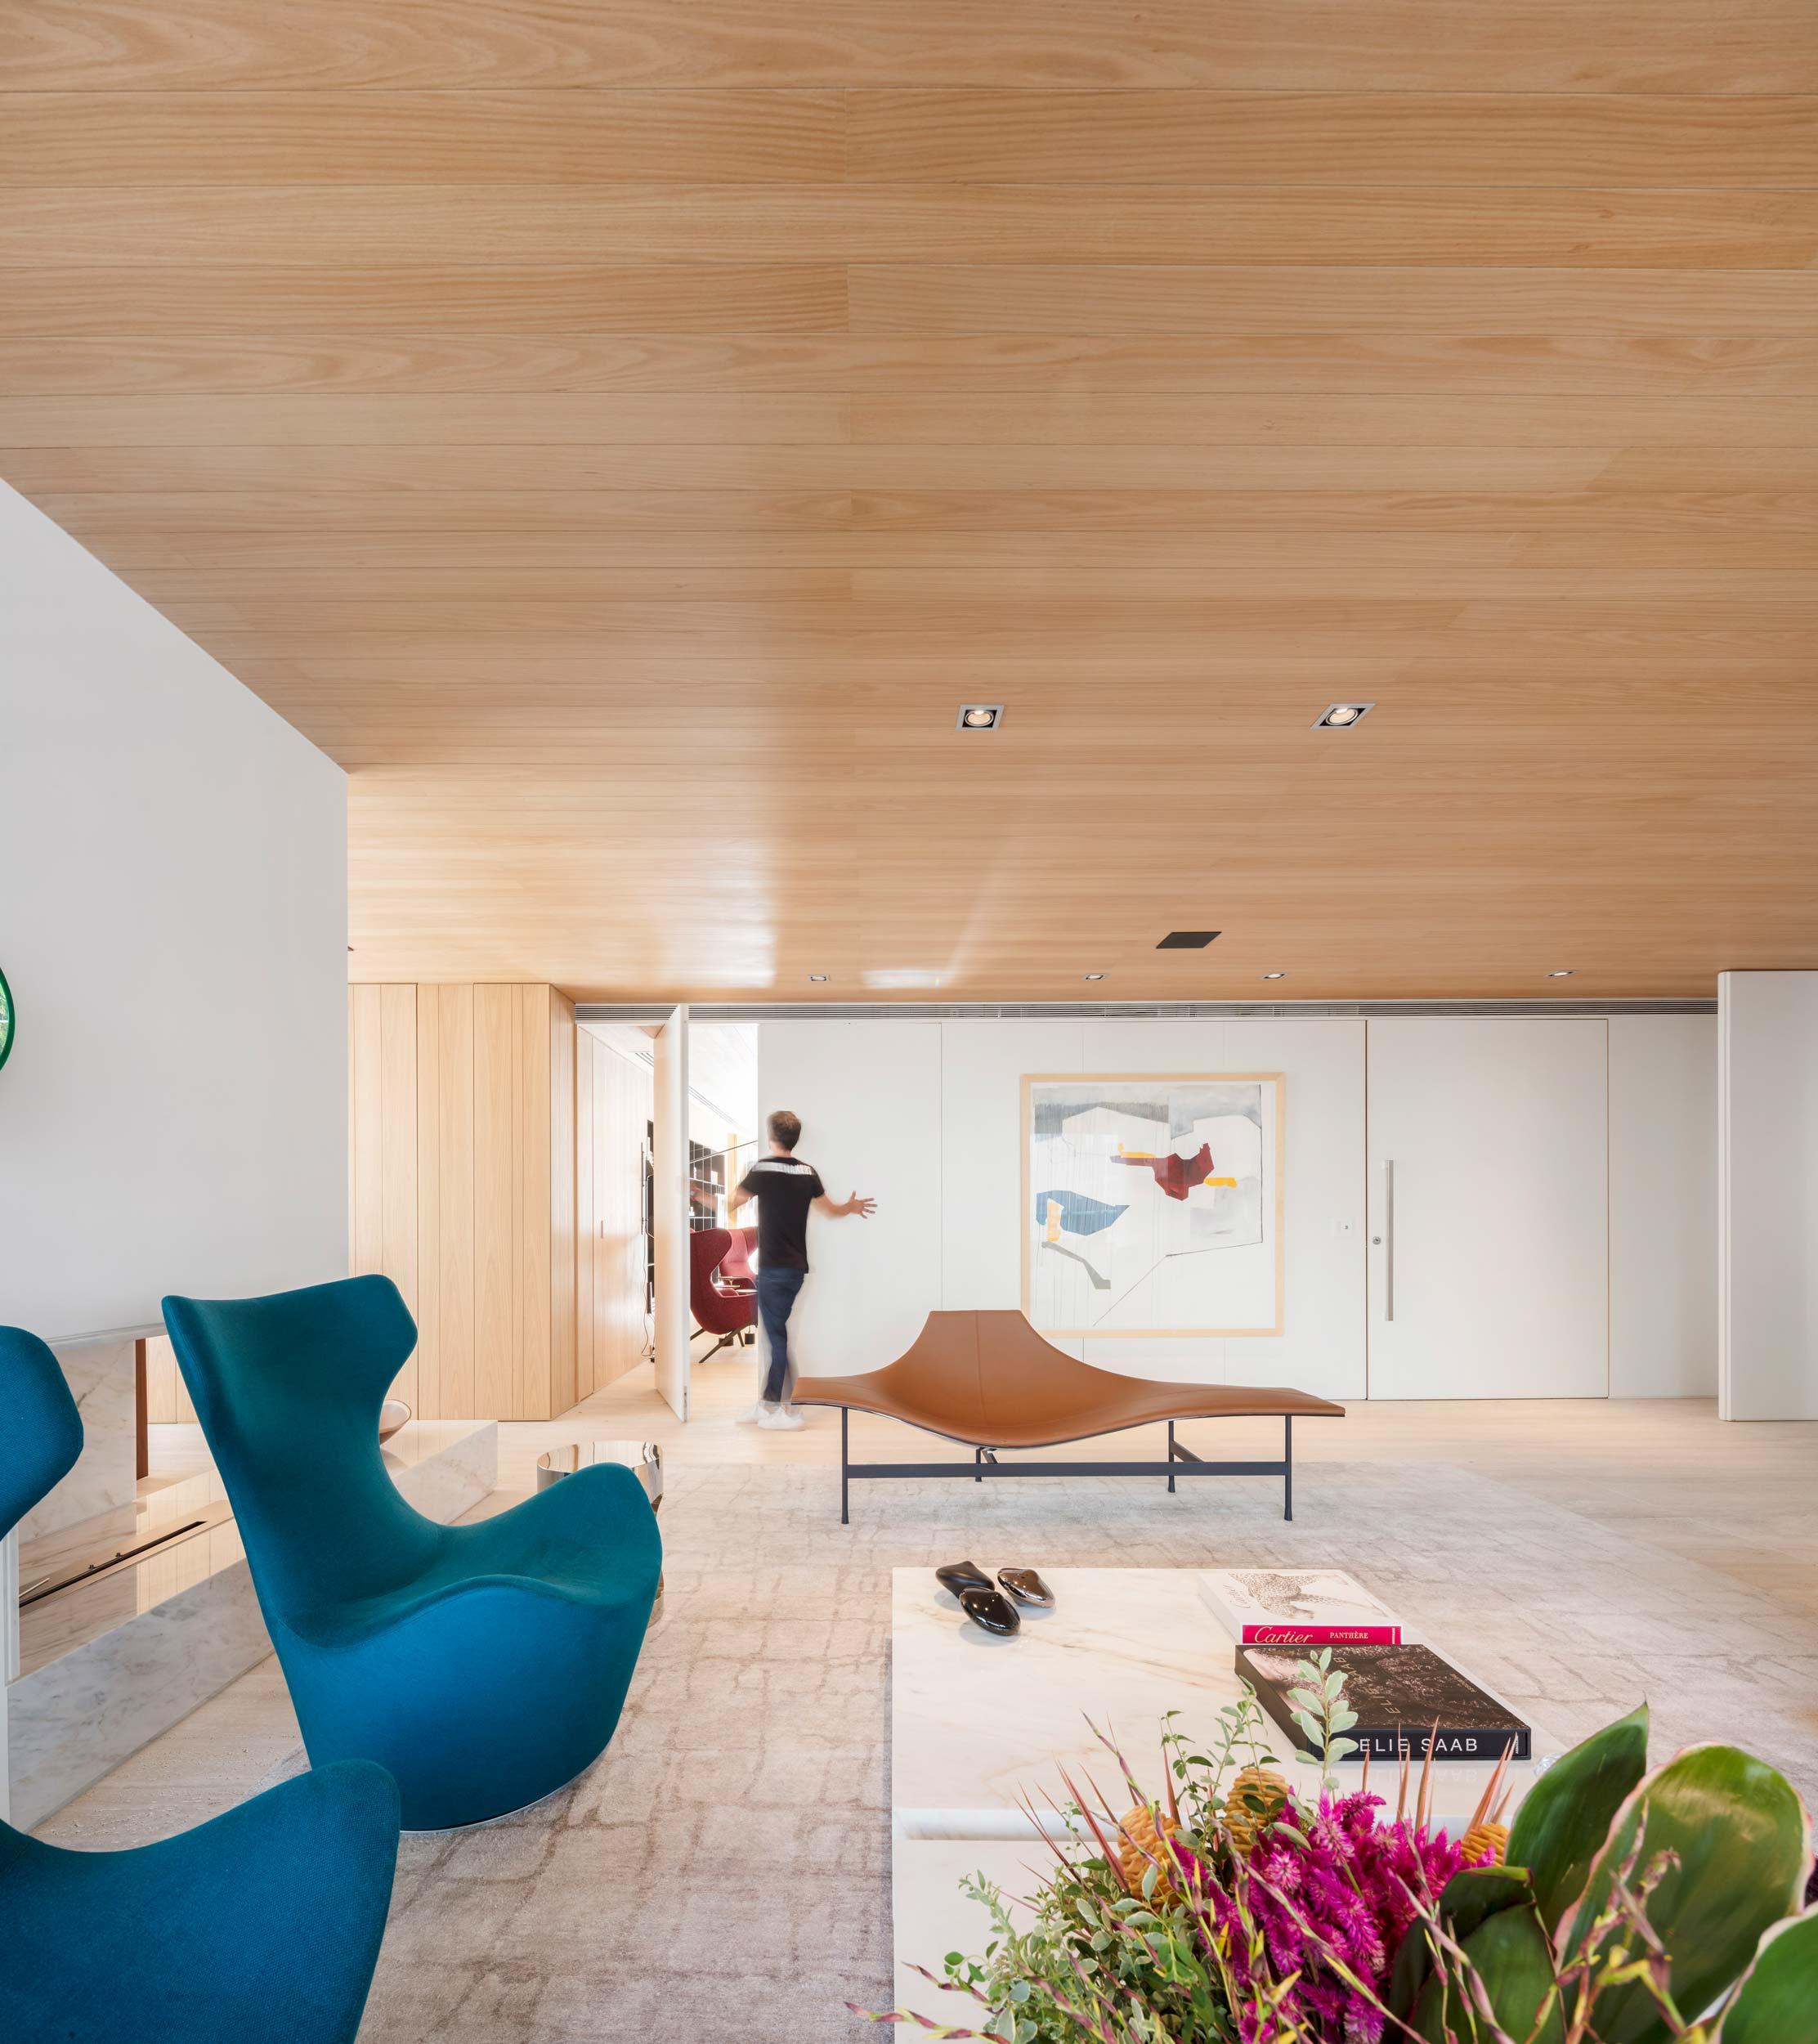 projeto-eretz-fernanda-marques-arquiteta-2.JPG